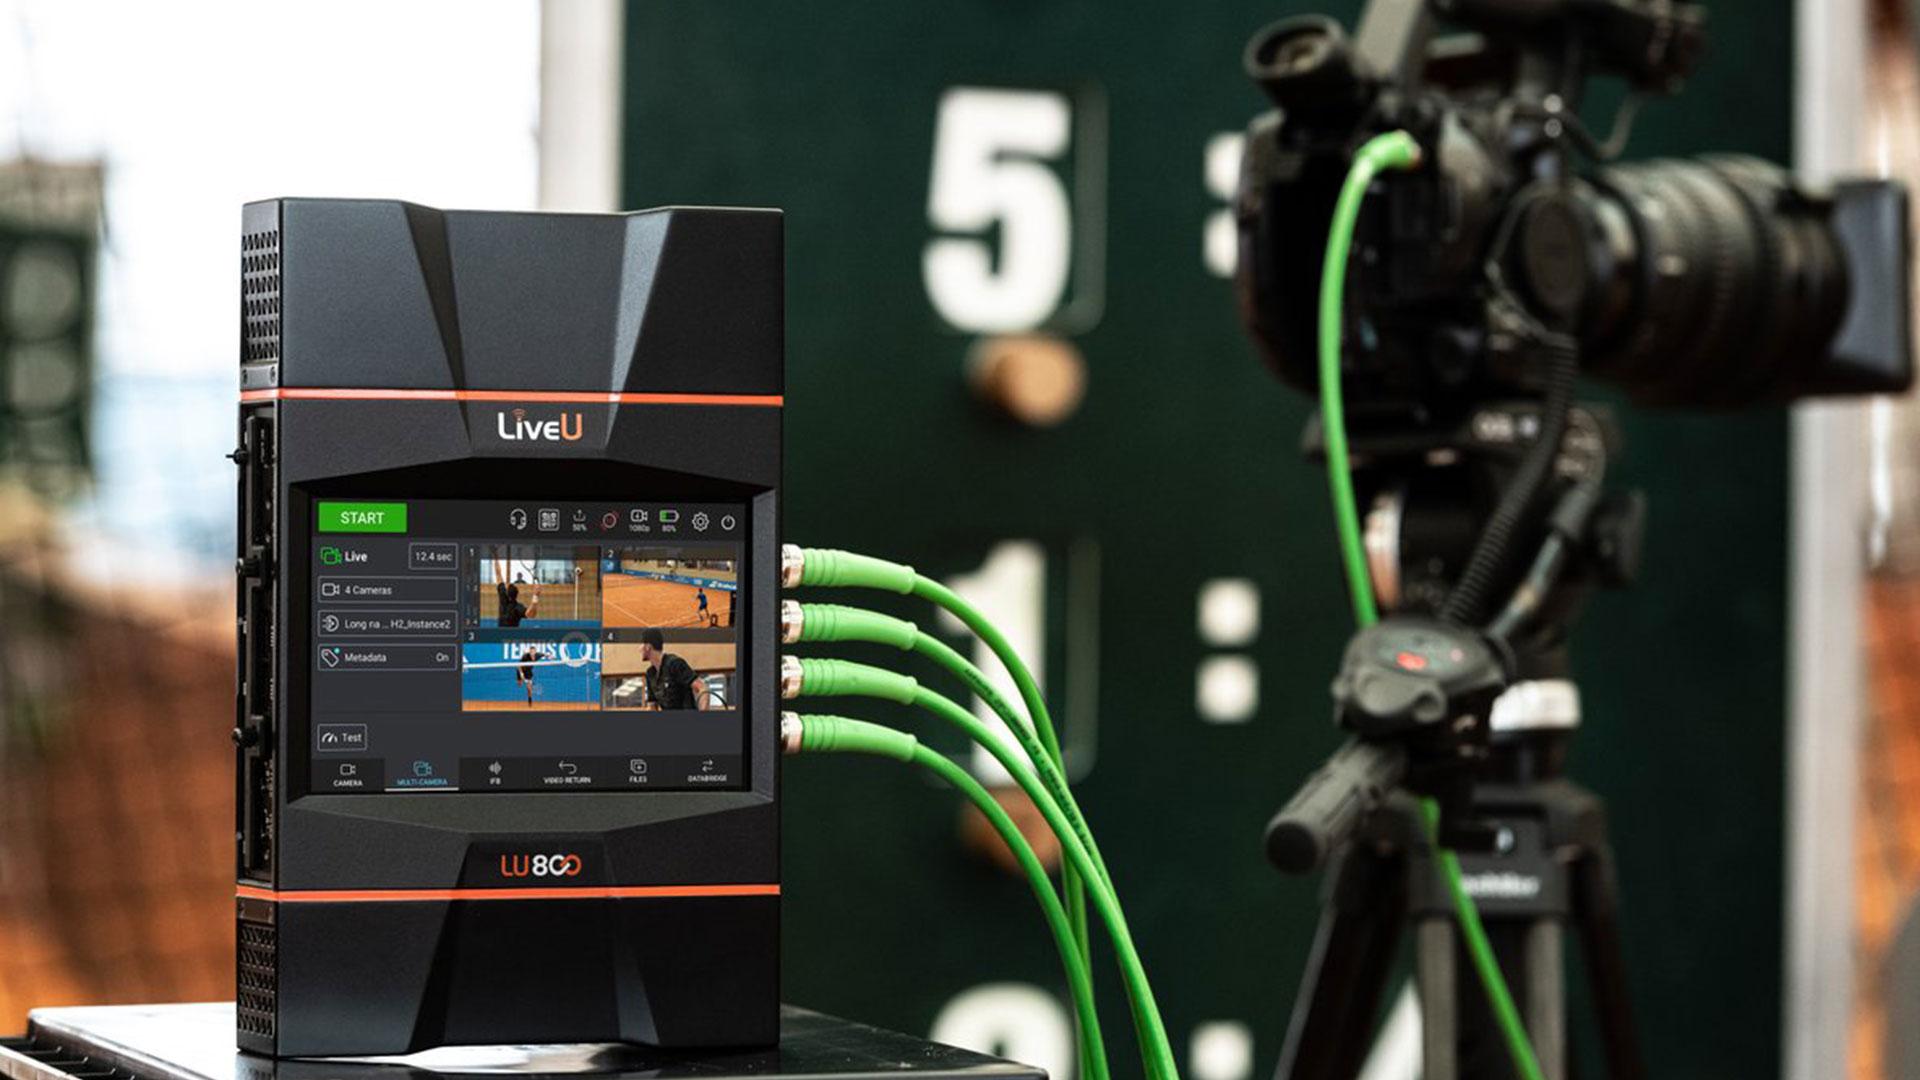 LiveUがLU800オールインワンのフィールドユニットを発売